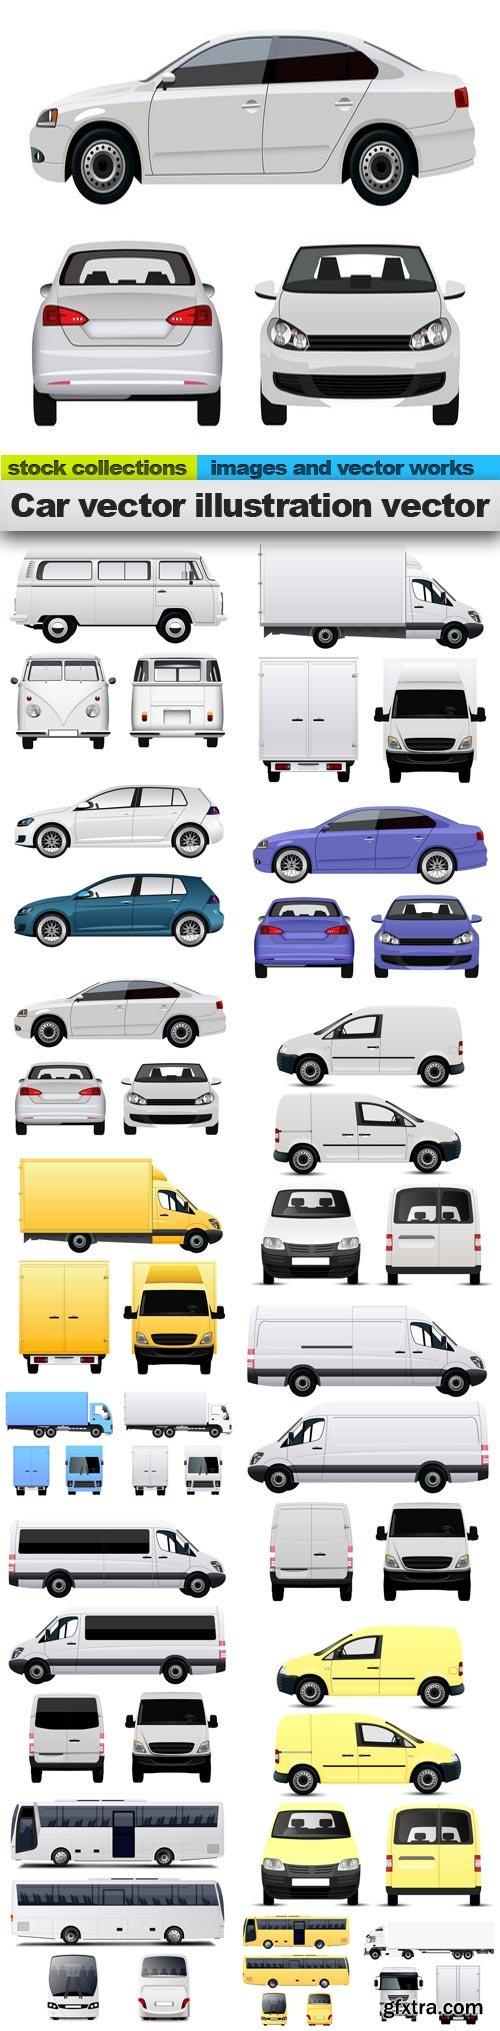 Car vector illustration vector, 15 x EPS